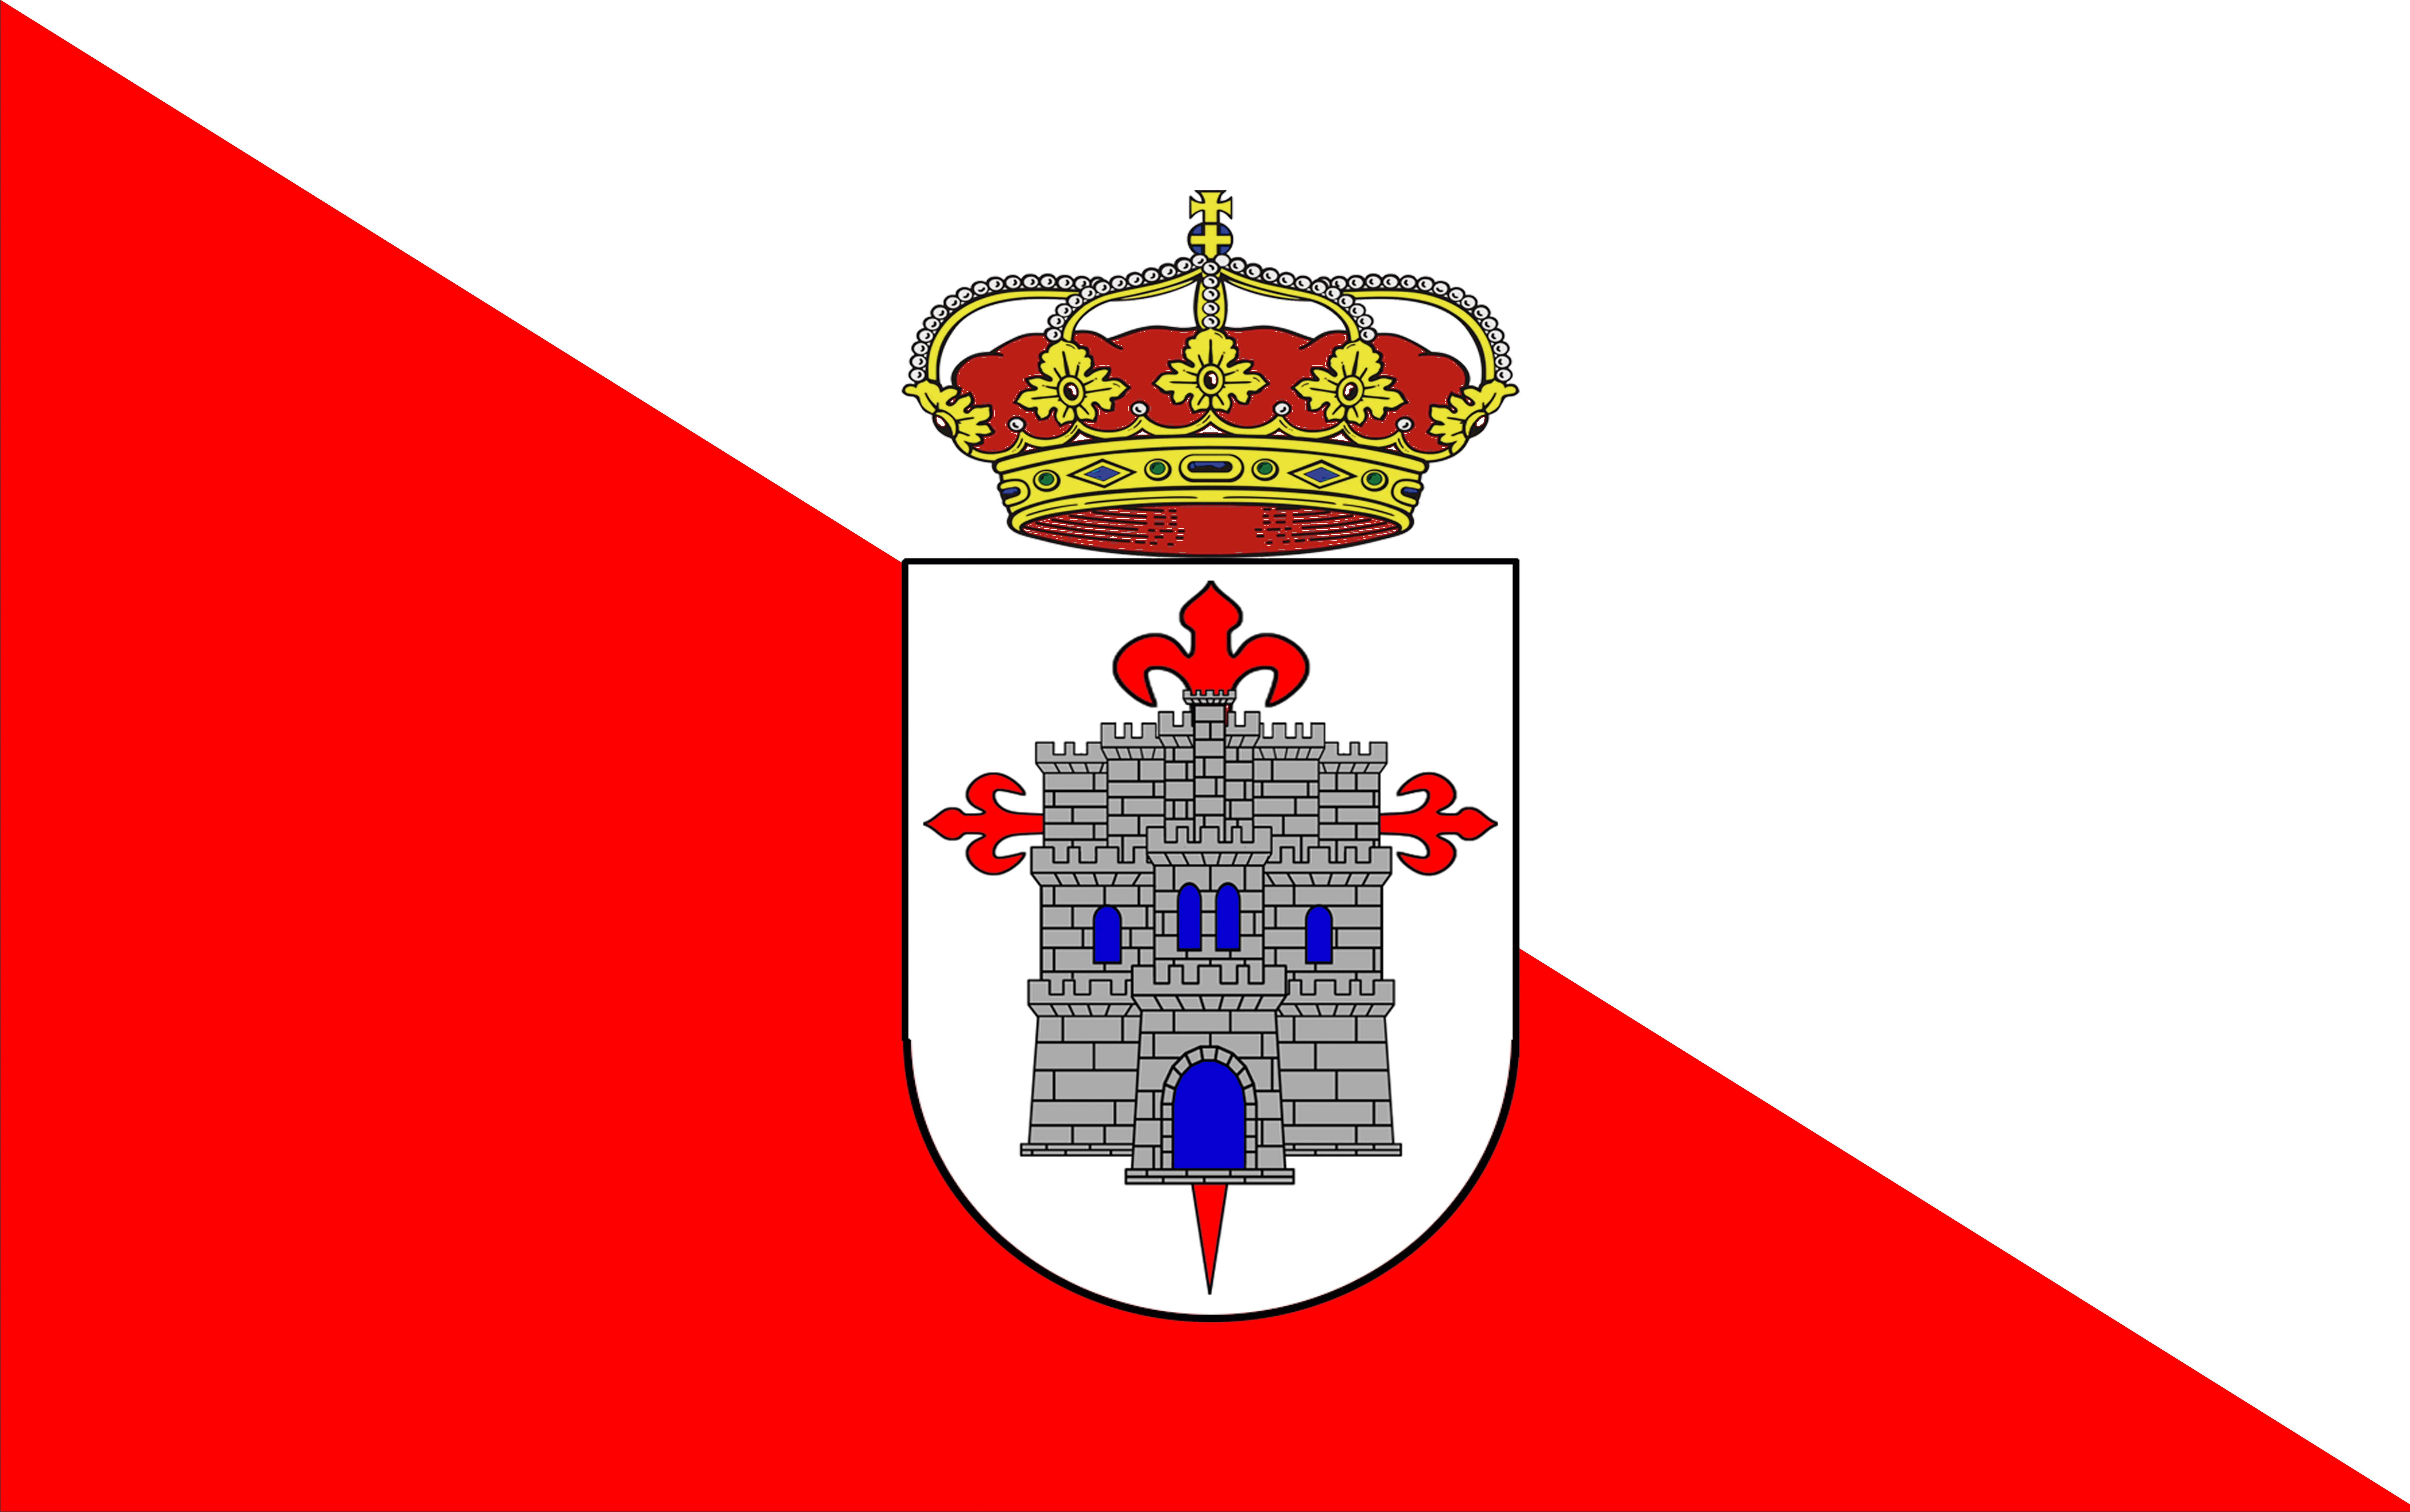 Gambar Eropah Simbol Spanduk Bendera Kastil Lambang Label